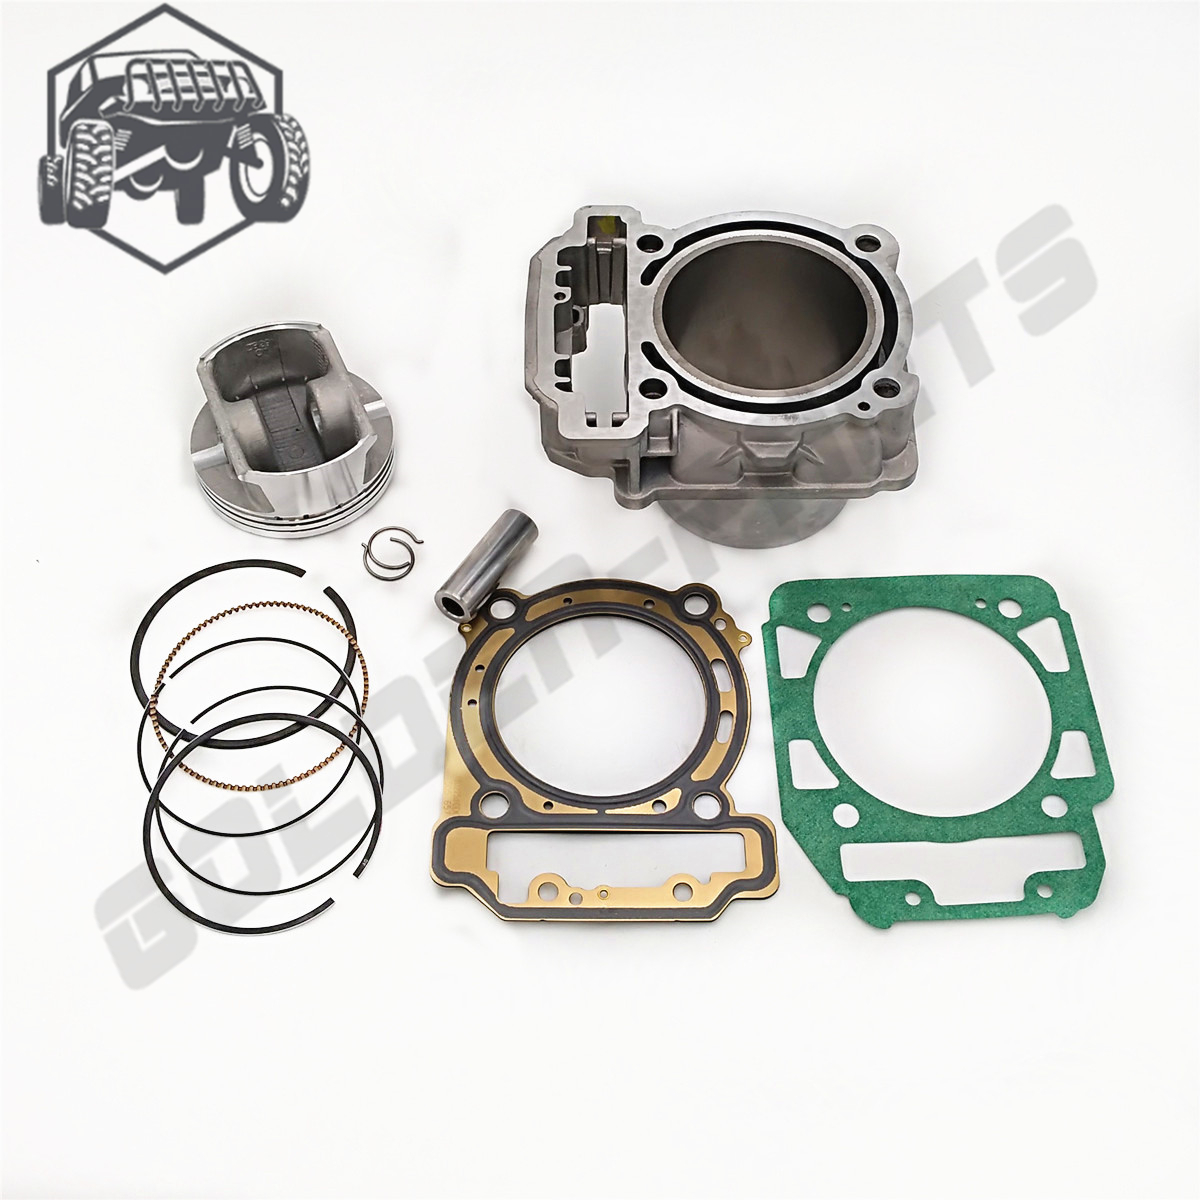 Oriental Power Carburetor Carb Choke Plunger Starter Valve Kit for 98-04 Honda TRX 450 Foreman